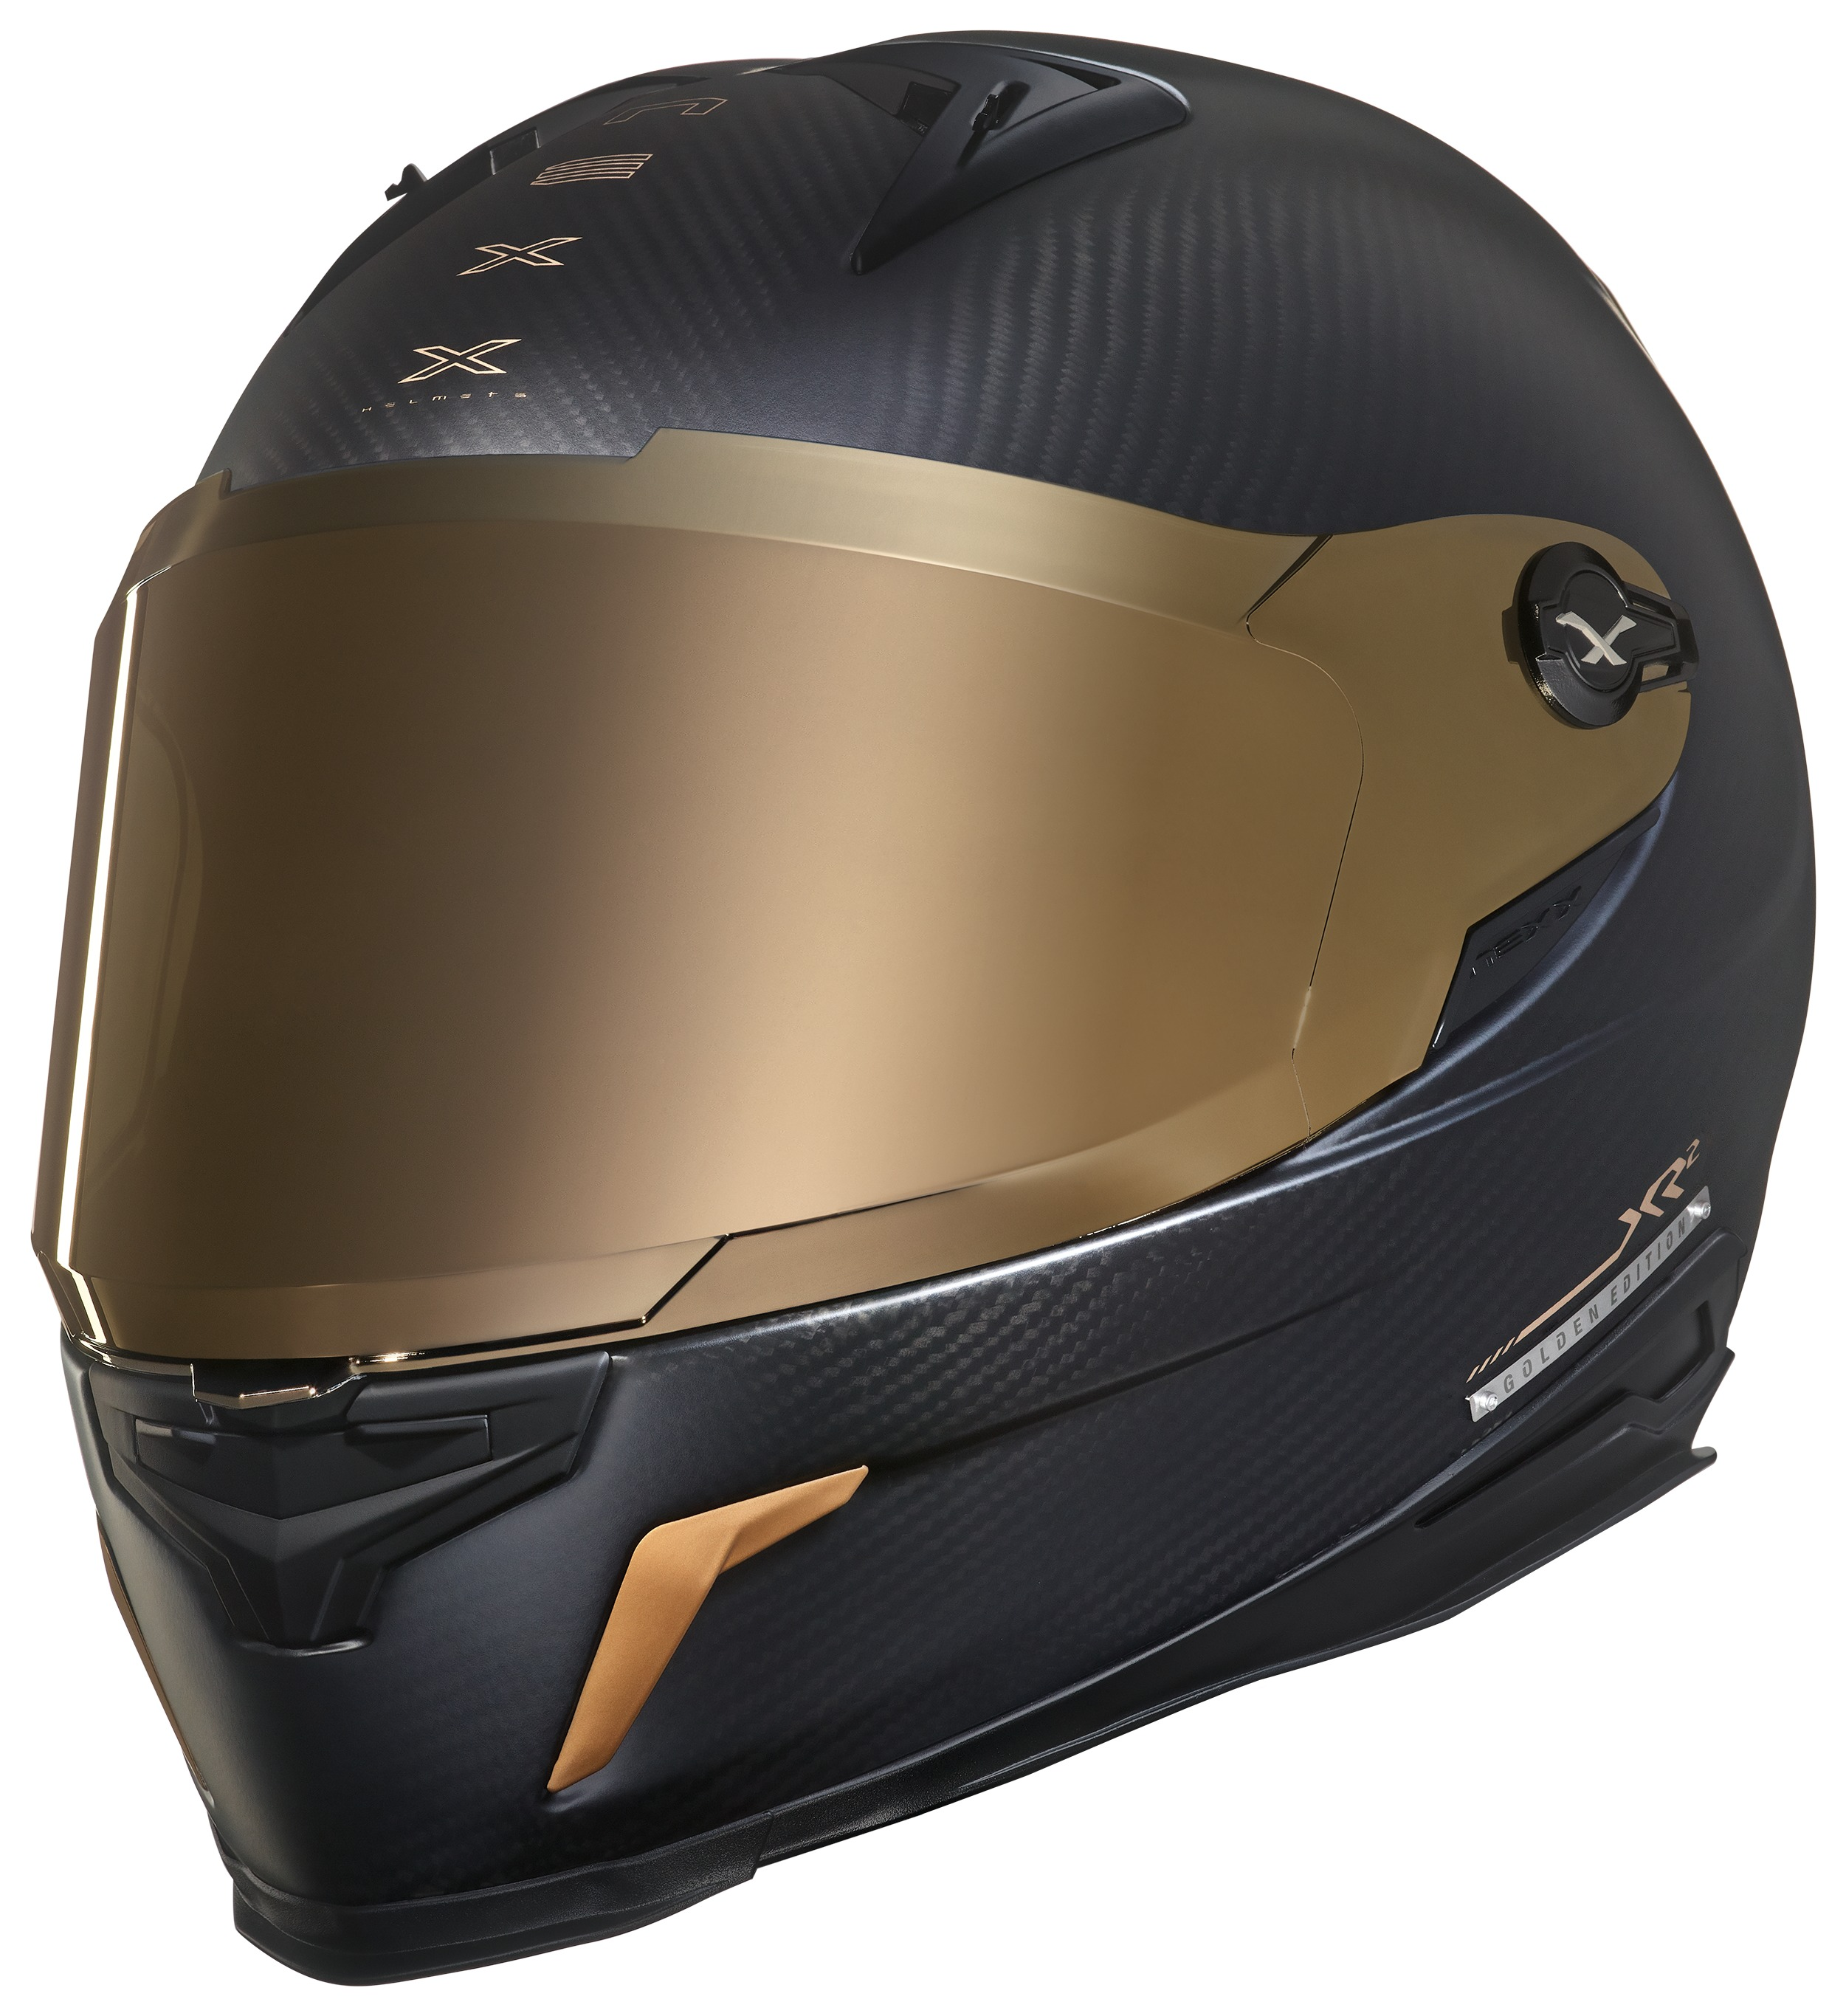 a1c5b0c9153d9 Nexx XR2 Carbon Golden Edition Helmet - RevZilla